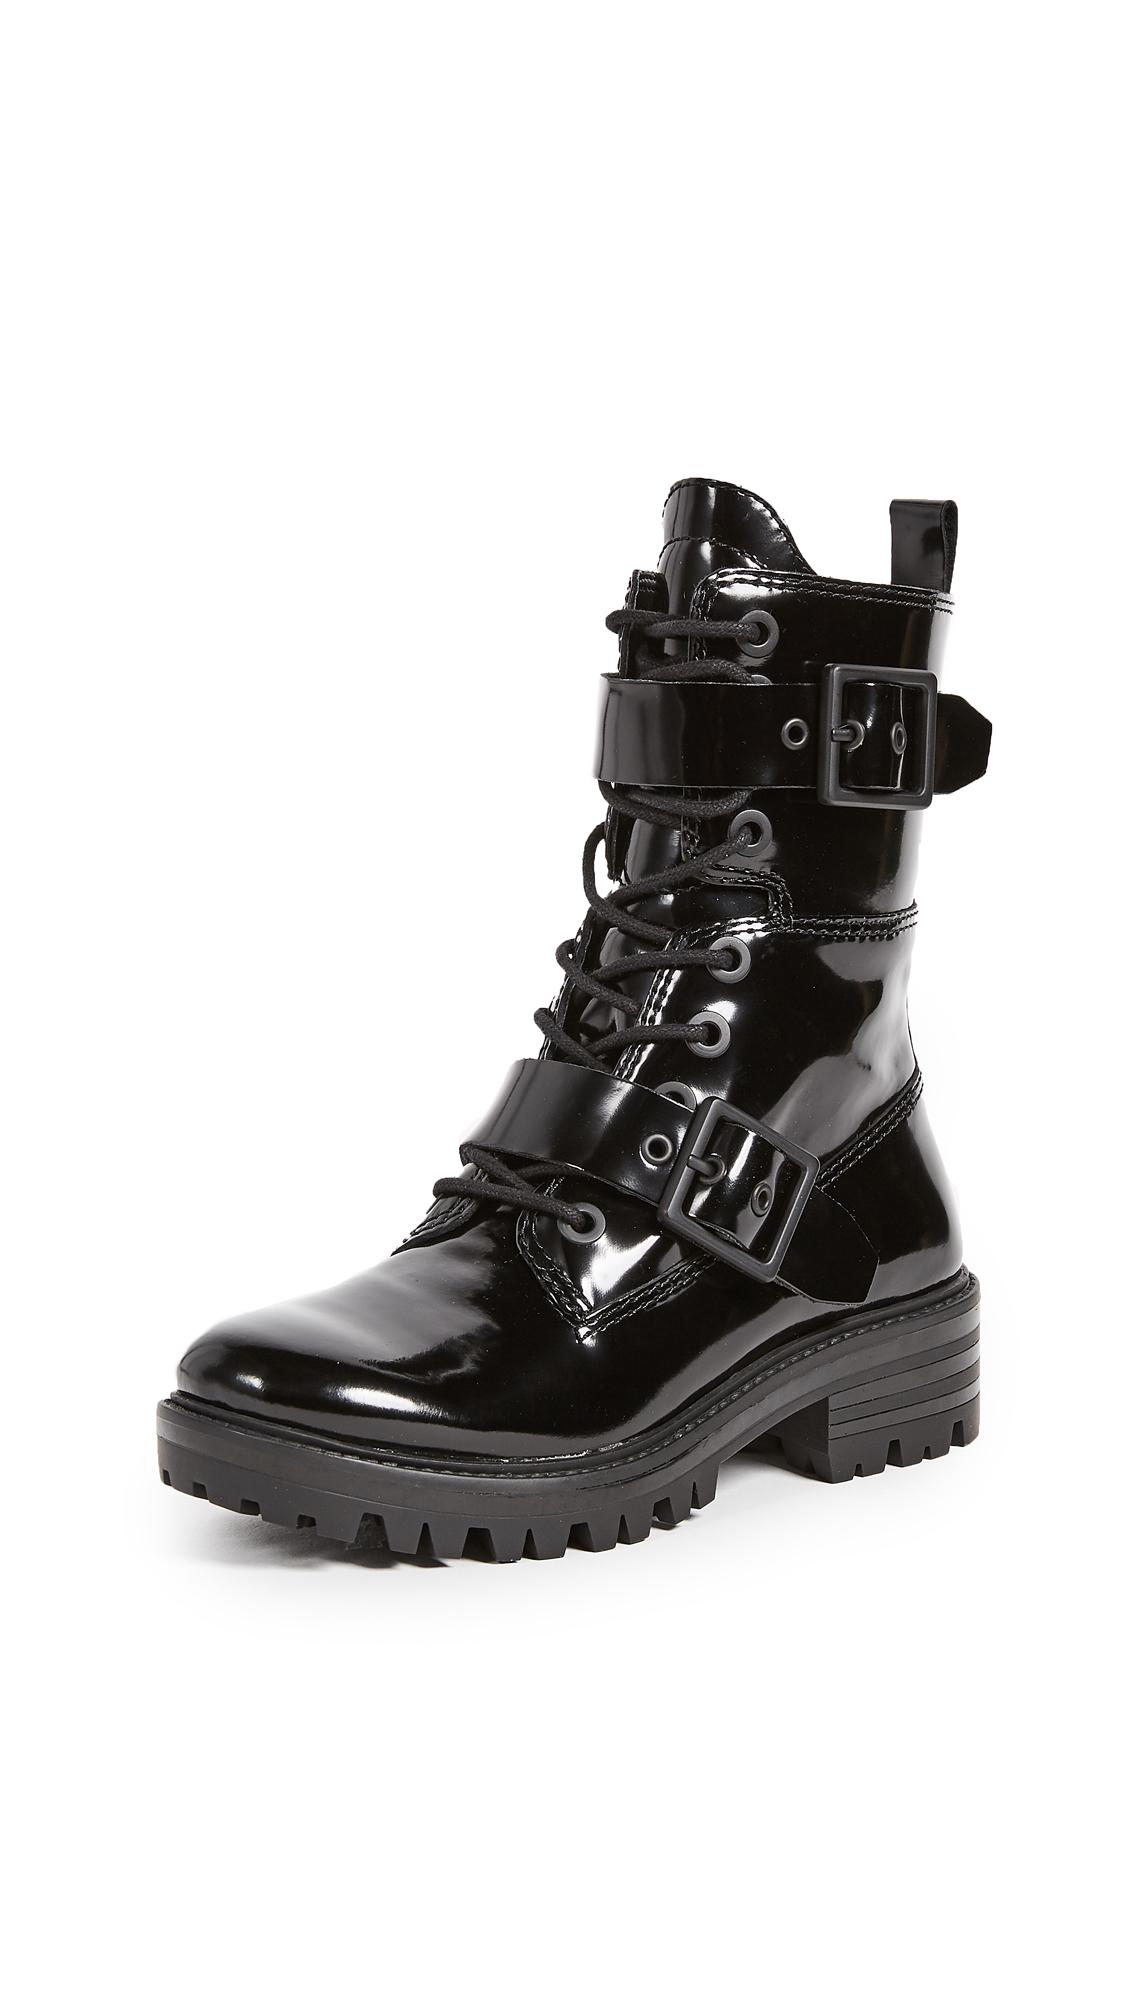 KENDALL + KYLIE Eliya Buckle Combat Boots - Black